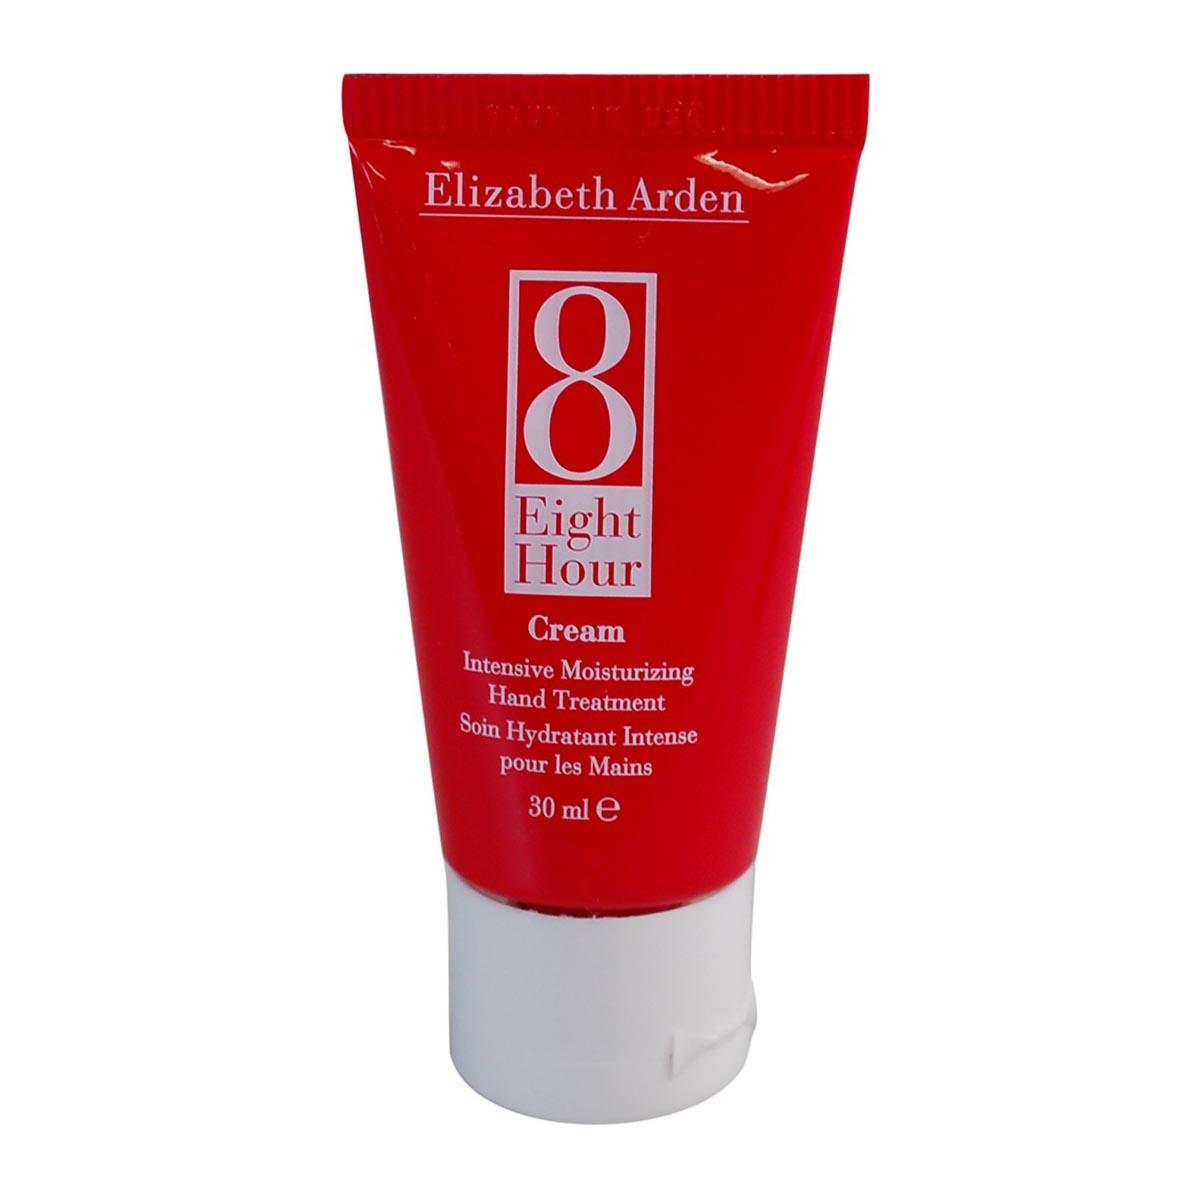 Elisabeth arden eight hour cream intensive moisturizing hand treatment 30ml sin caja